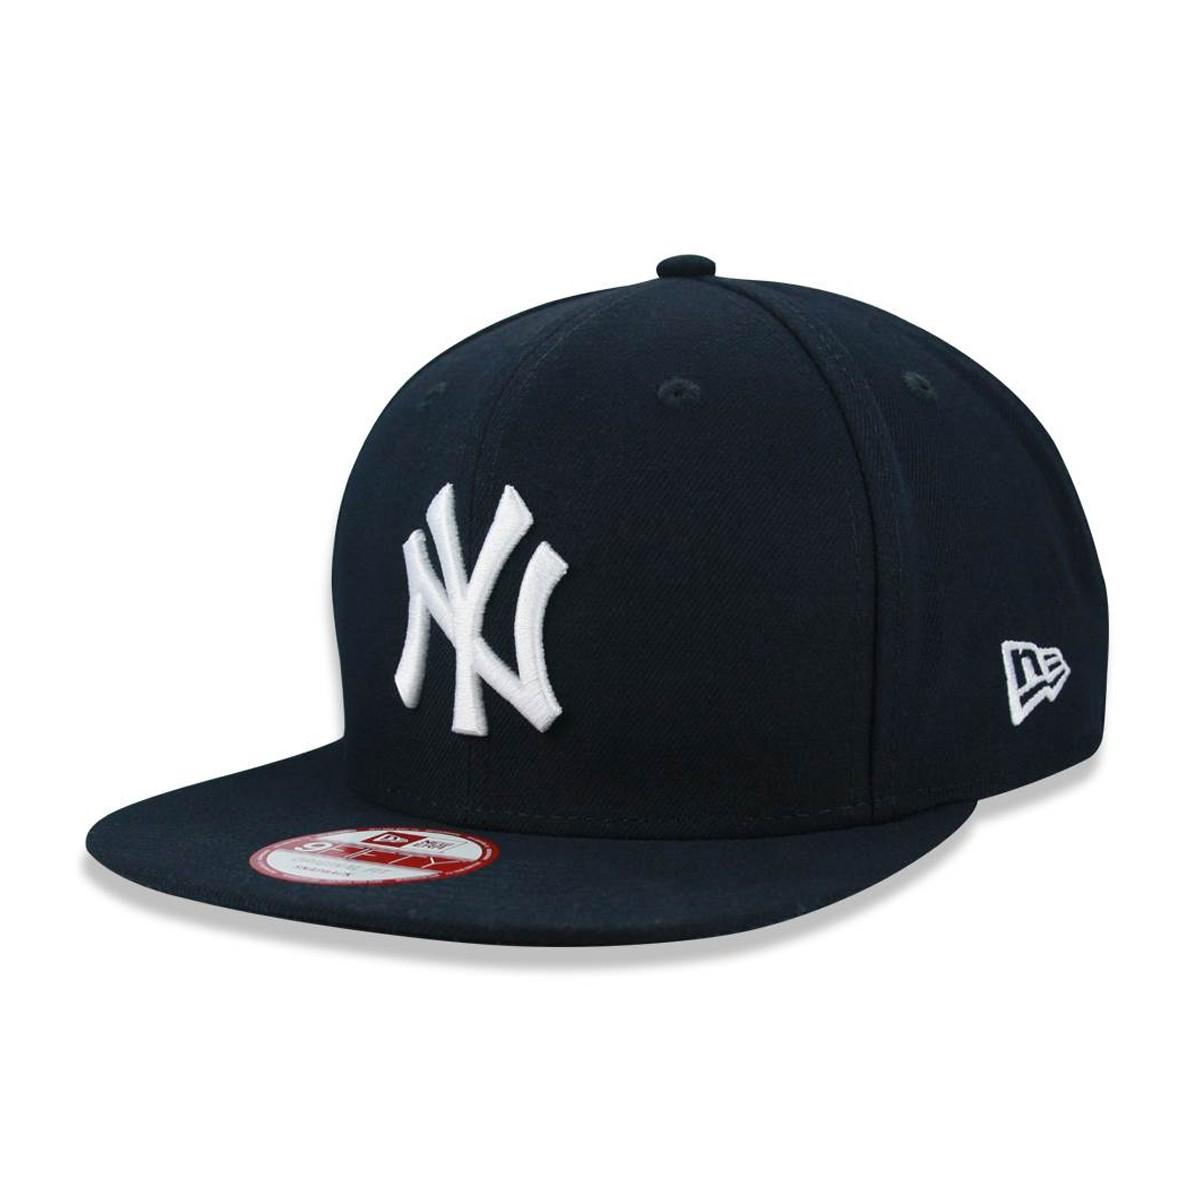 Boné New Era Aba Reta Yankees Azul Marinho